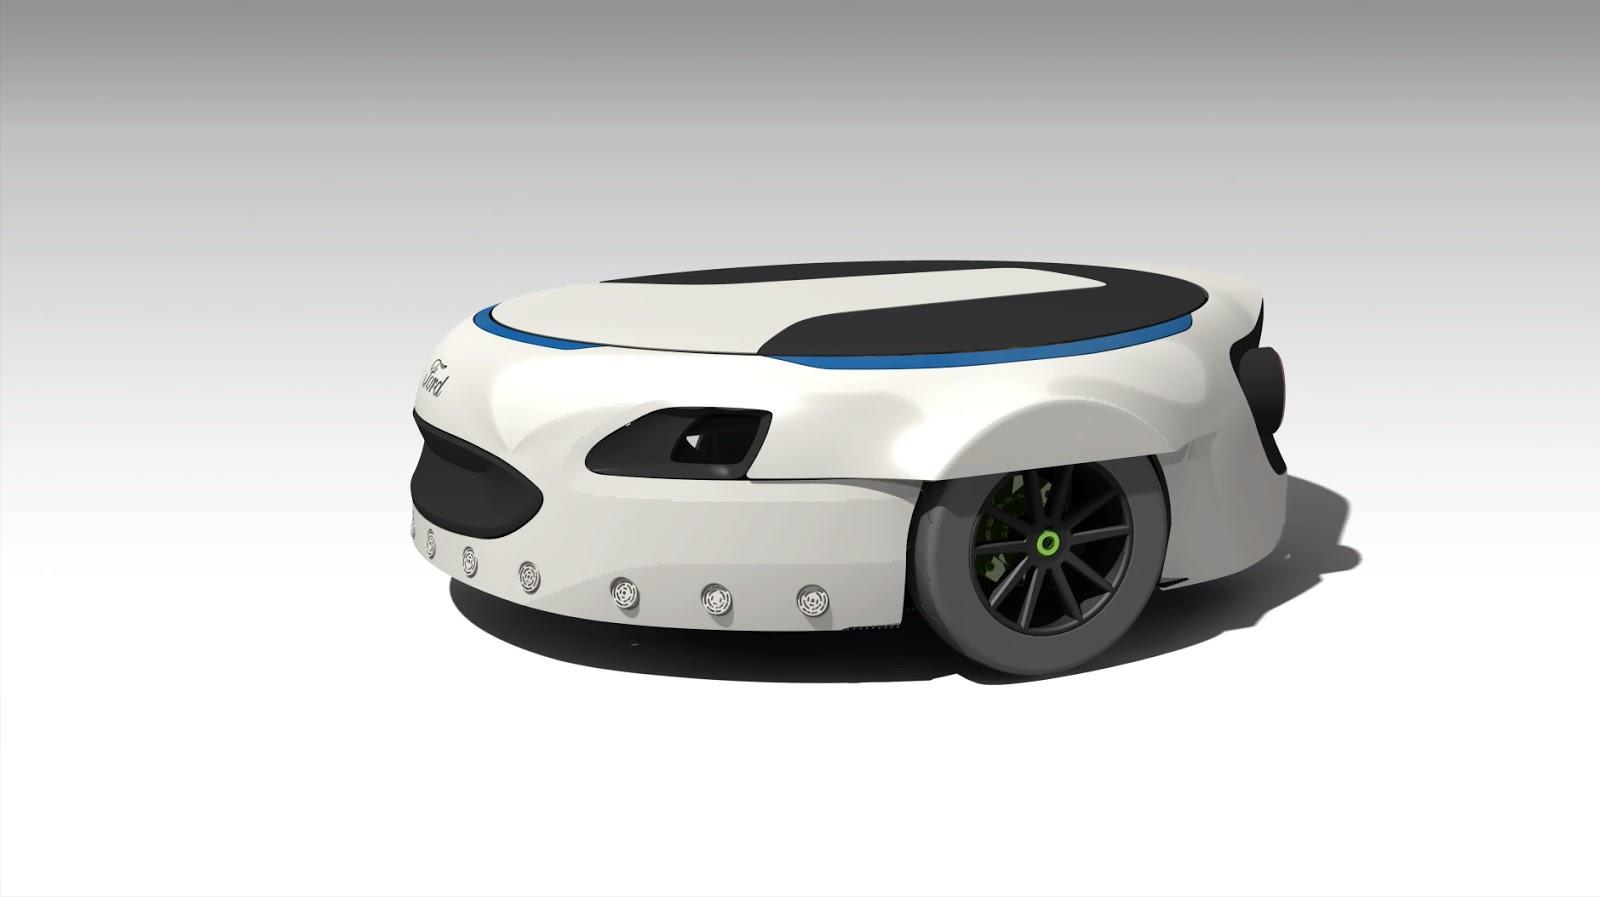 117 R6 Carr-E : Η ατομική πλατφόρμα μετακίνησης σε σχήμα και μέγεθος ρεζέρβας! Carr-E, Electric cars, Ford, videos, Τεχνολογία